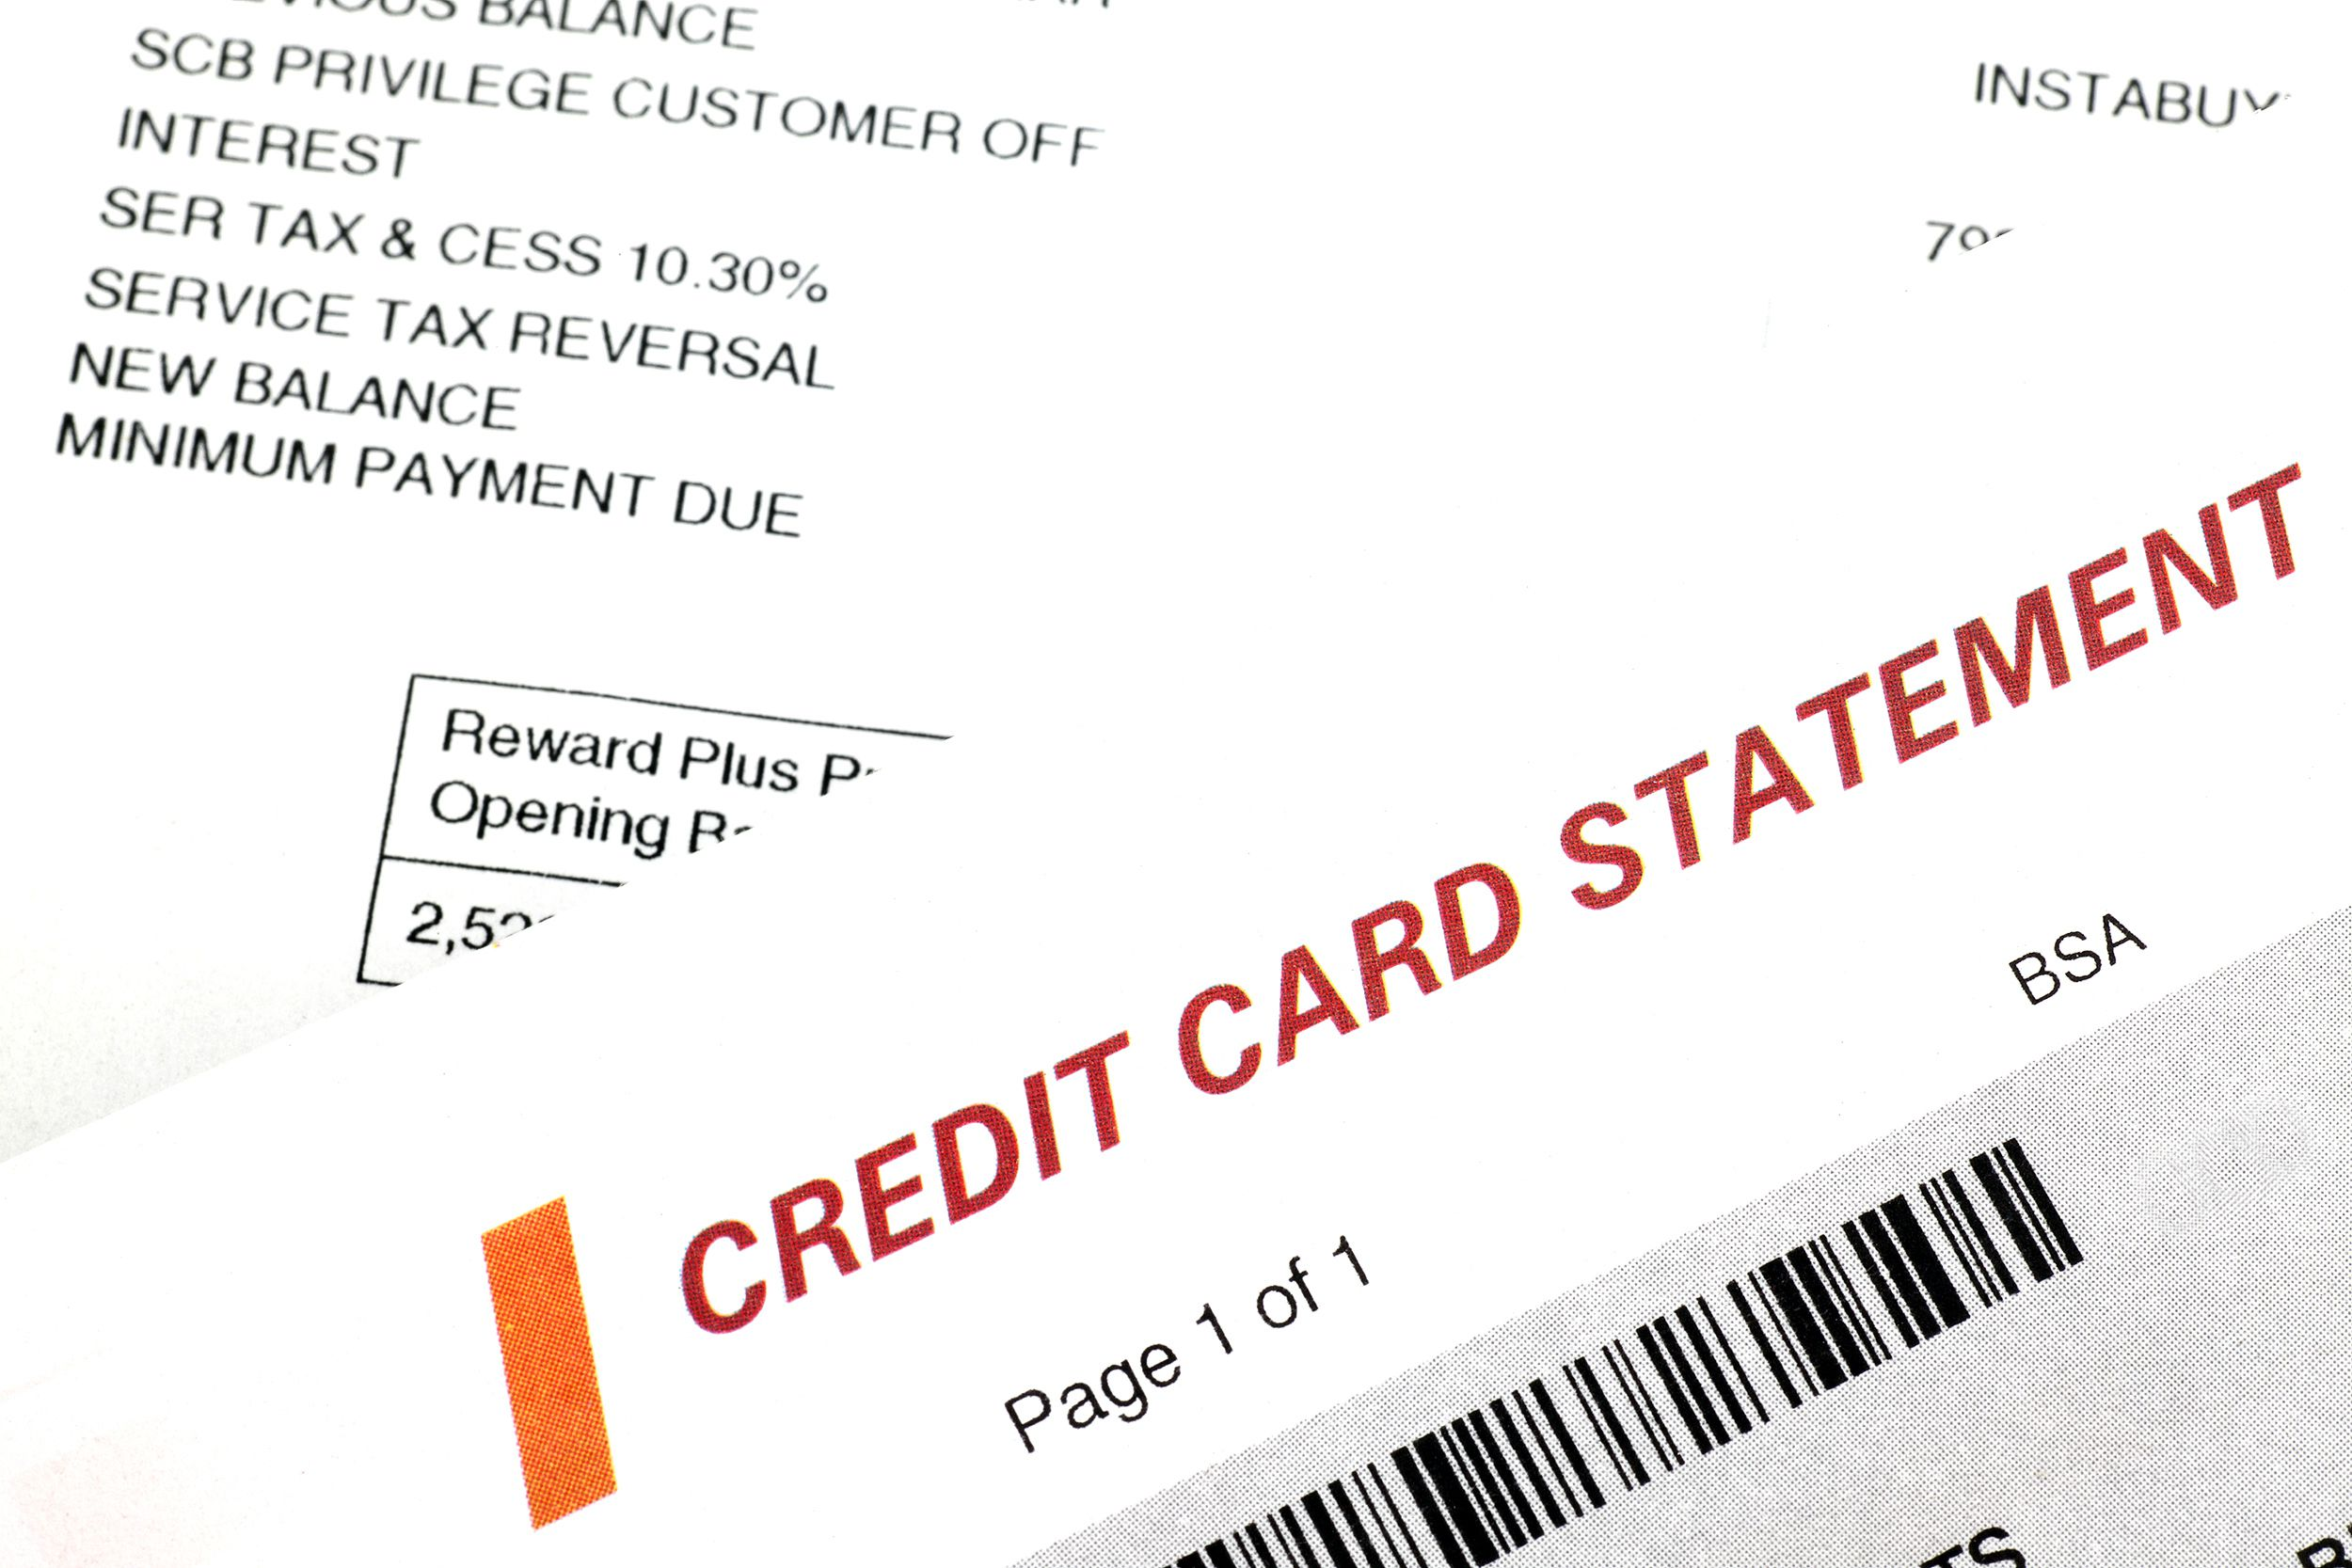 Security Bank Credit Card Online Billing Statement